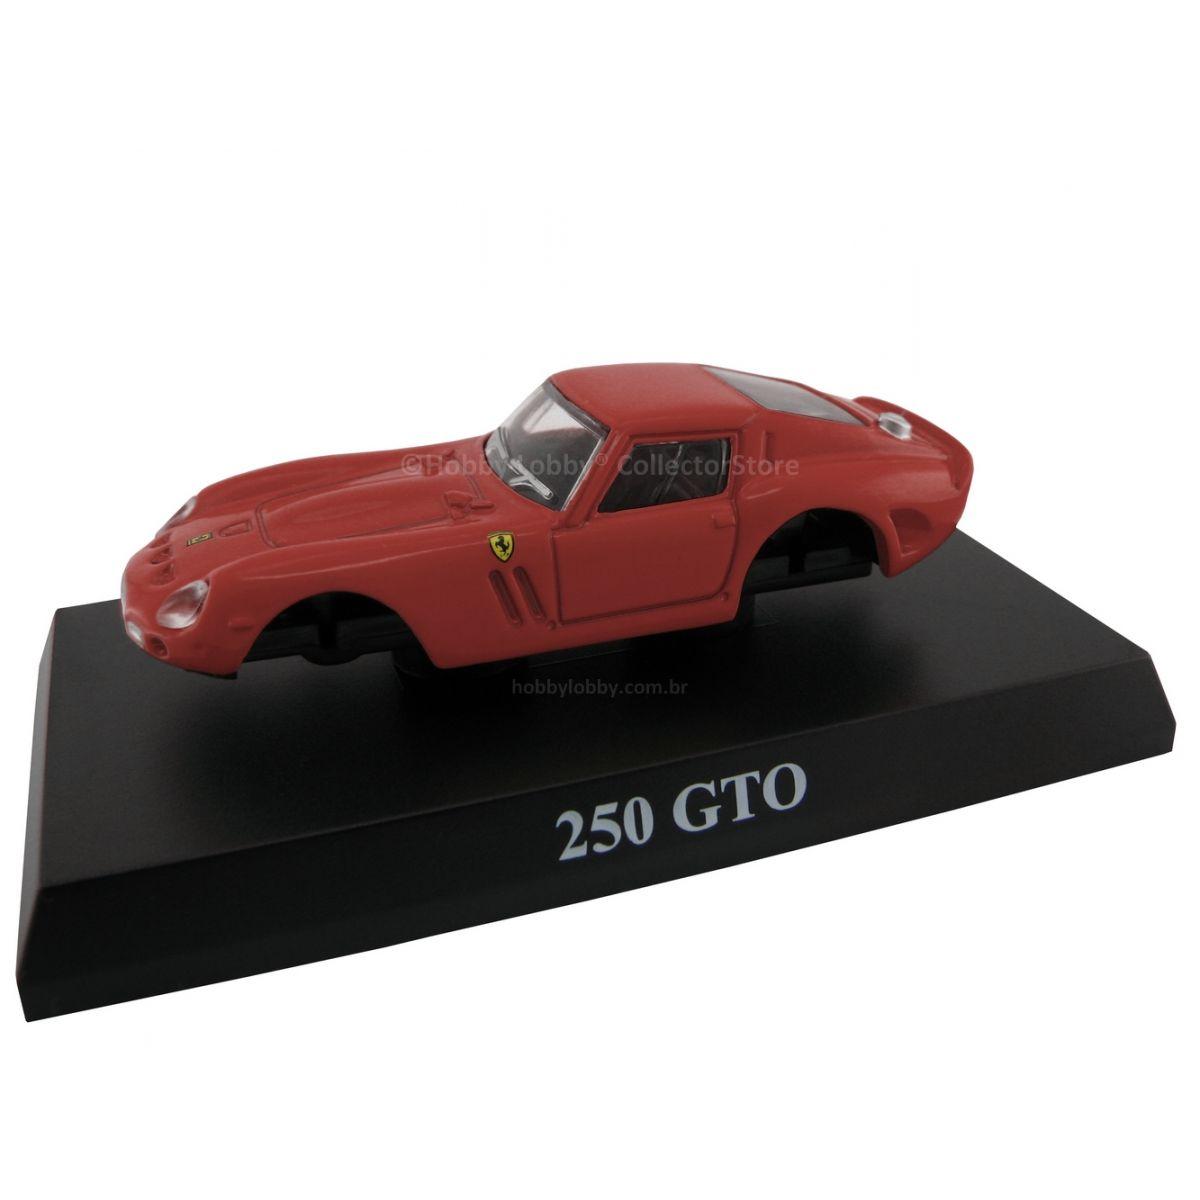 Kyosho - Ferrari Minicar Collection II - Ferrari 250 GTO (vermelha)  - Hobby Lobby CollectorStore